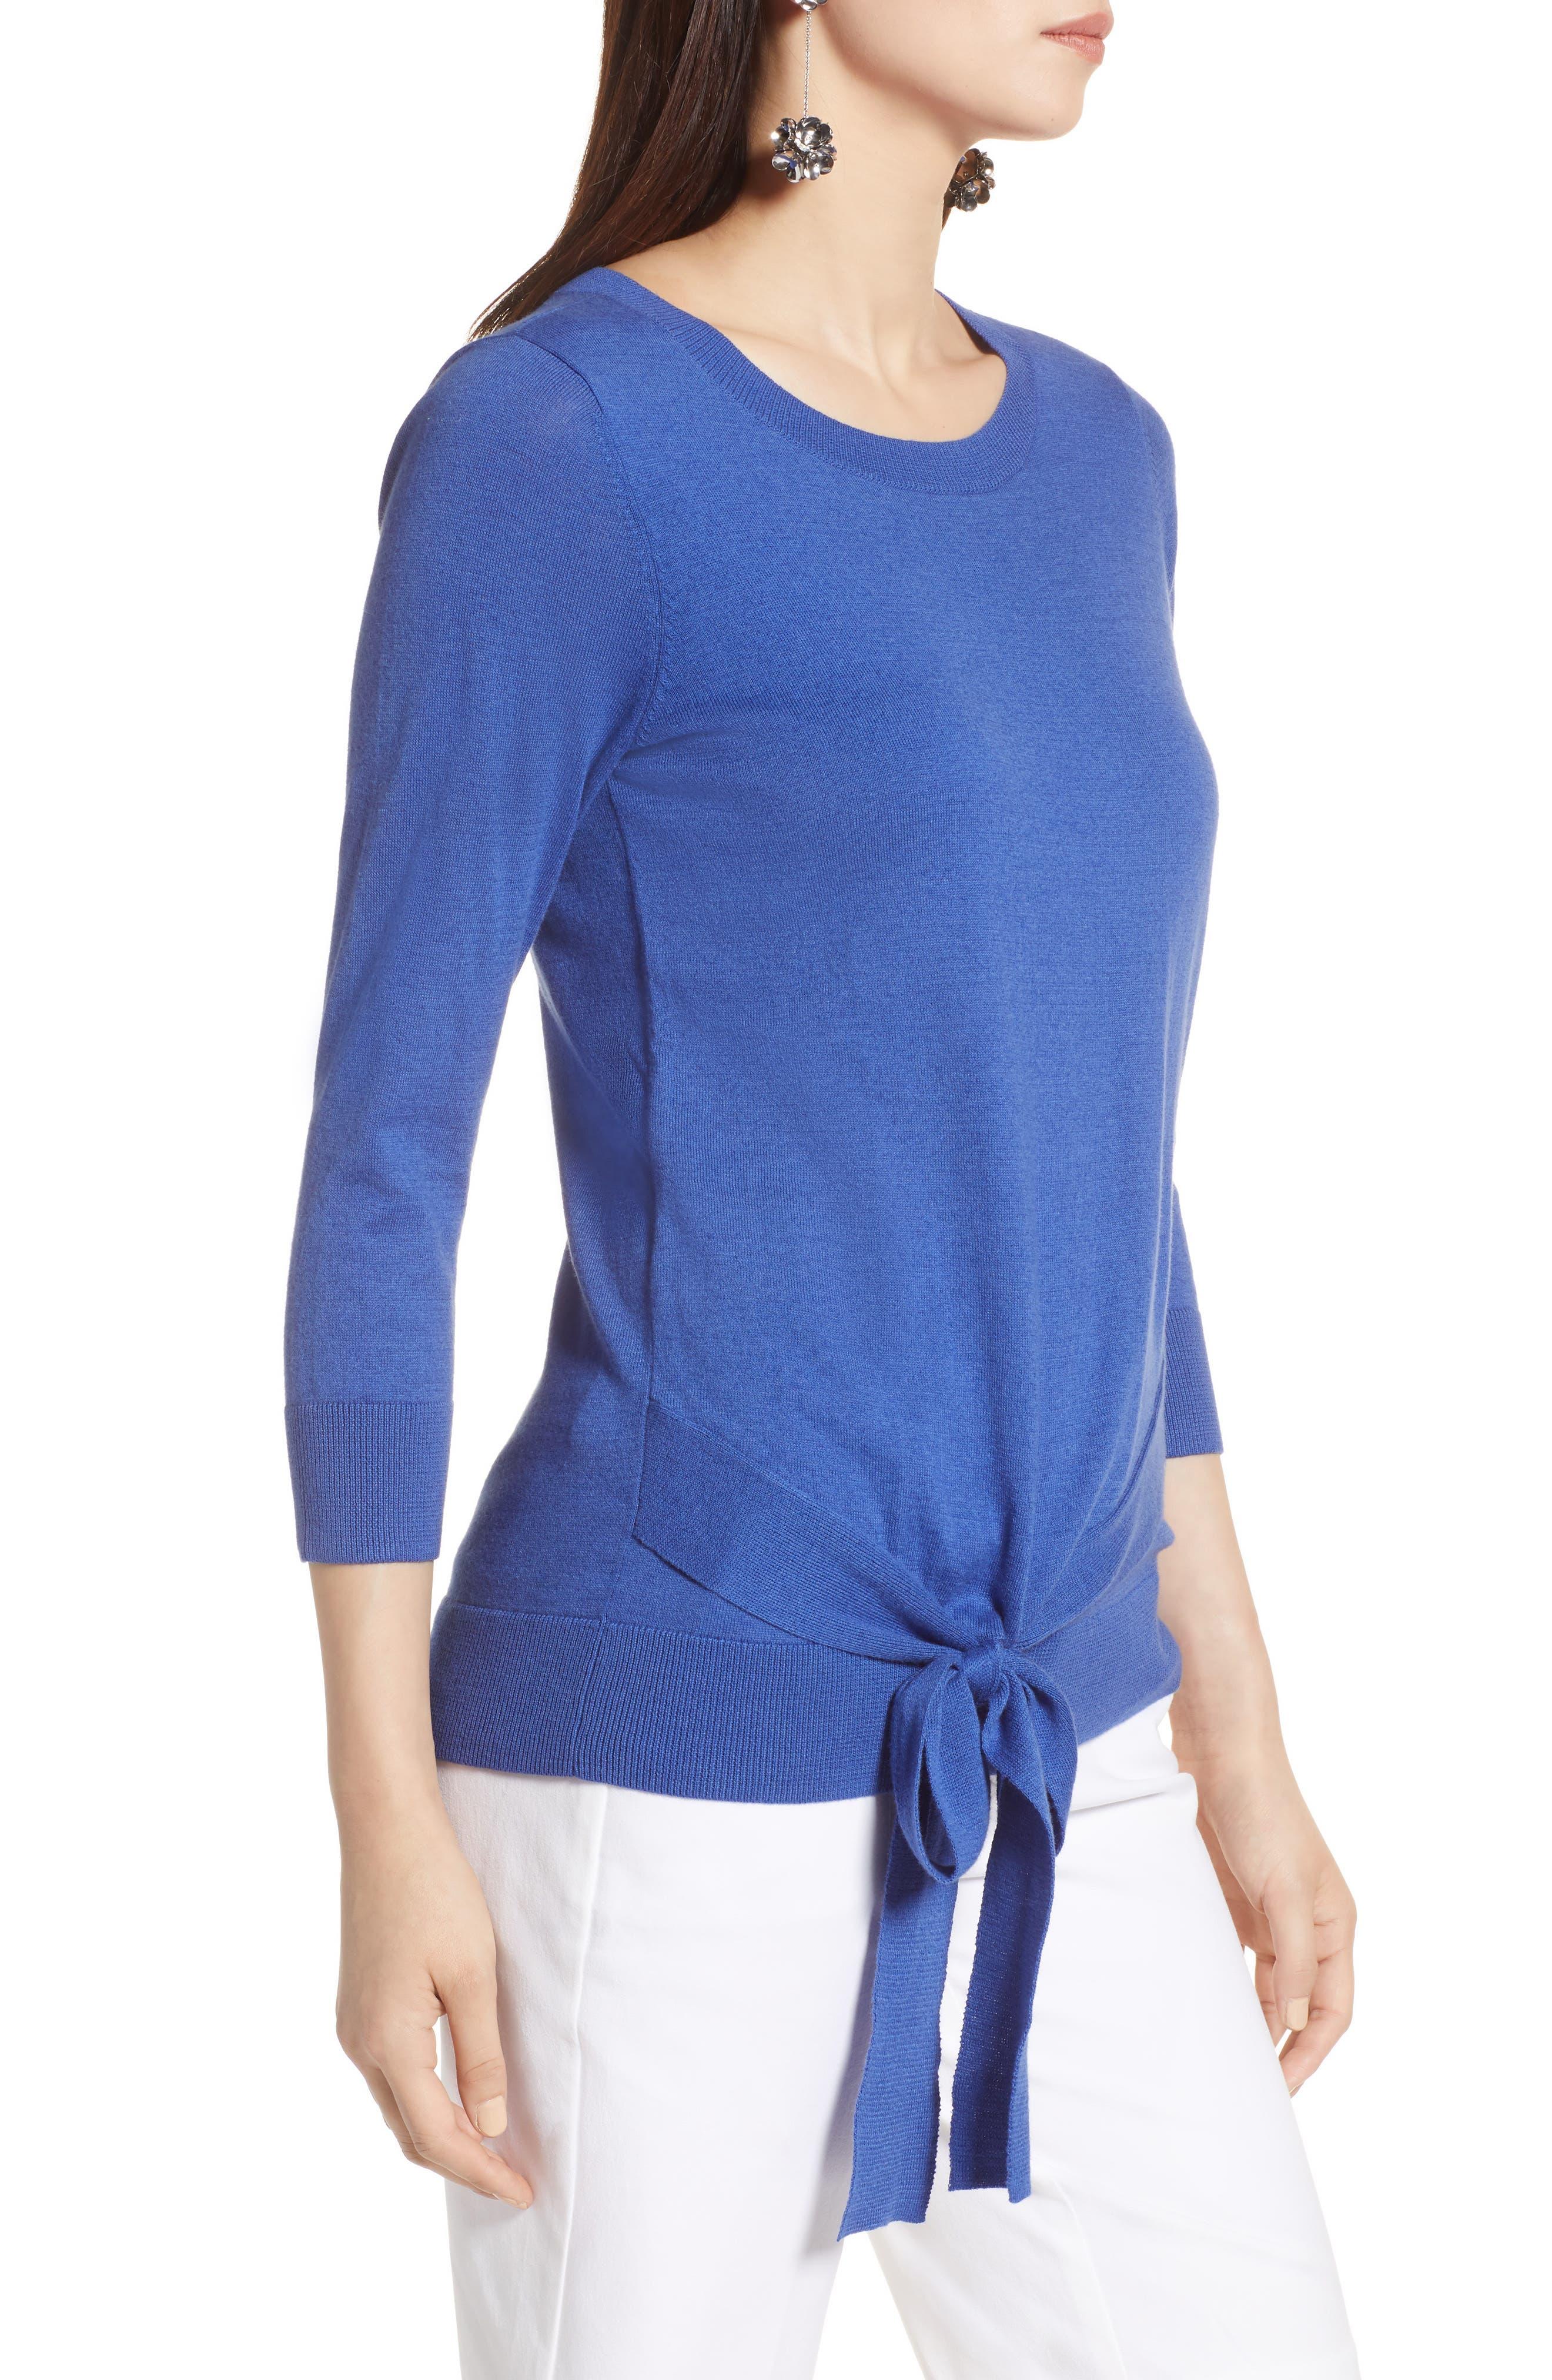 Pima Cotton Blend Tie Sweater,                             Alternate thumbnail 3, color,                             Blue Marine